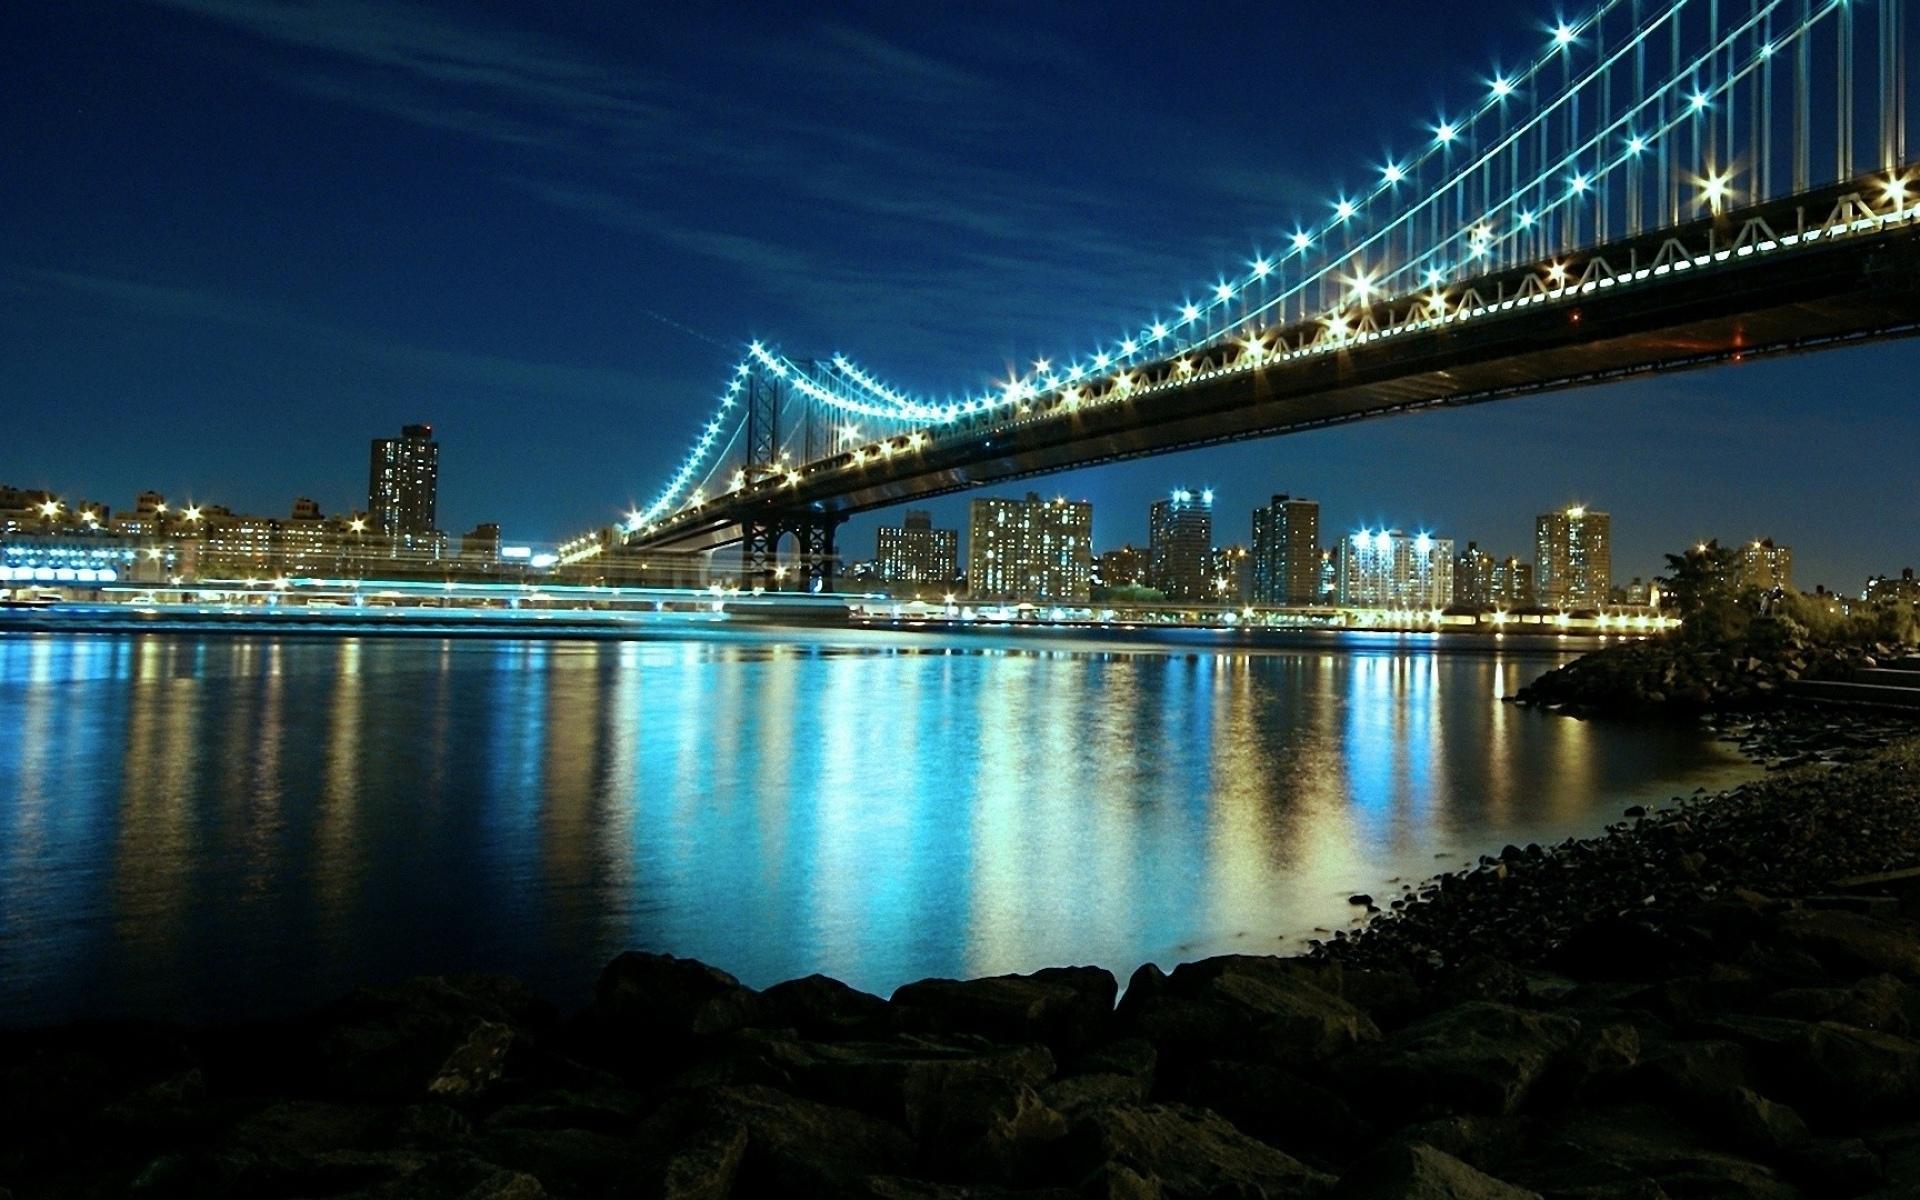 огни мост город ночь бесплатно